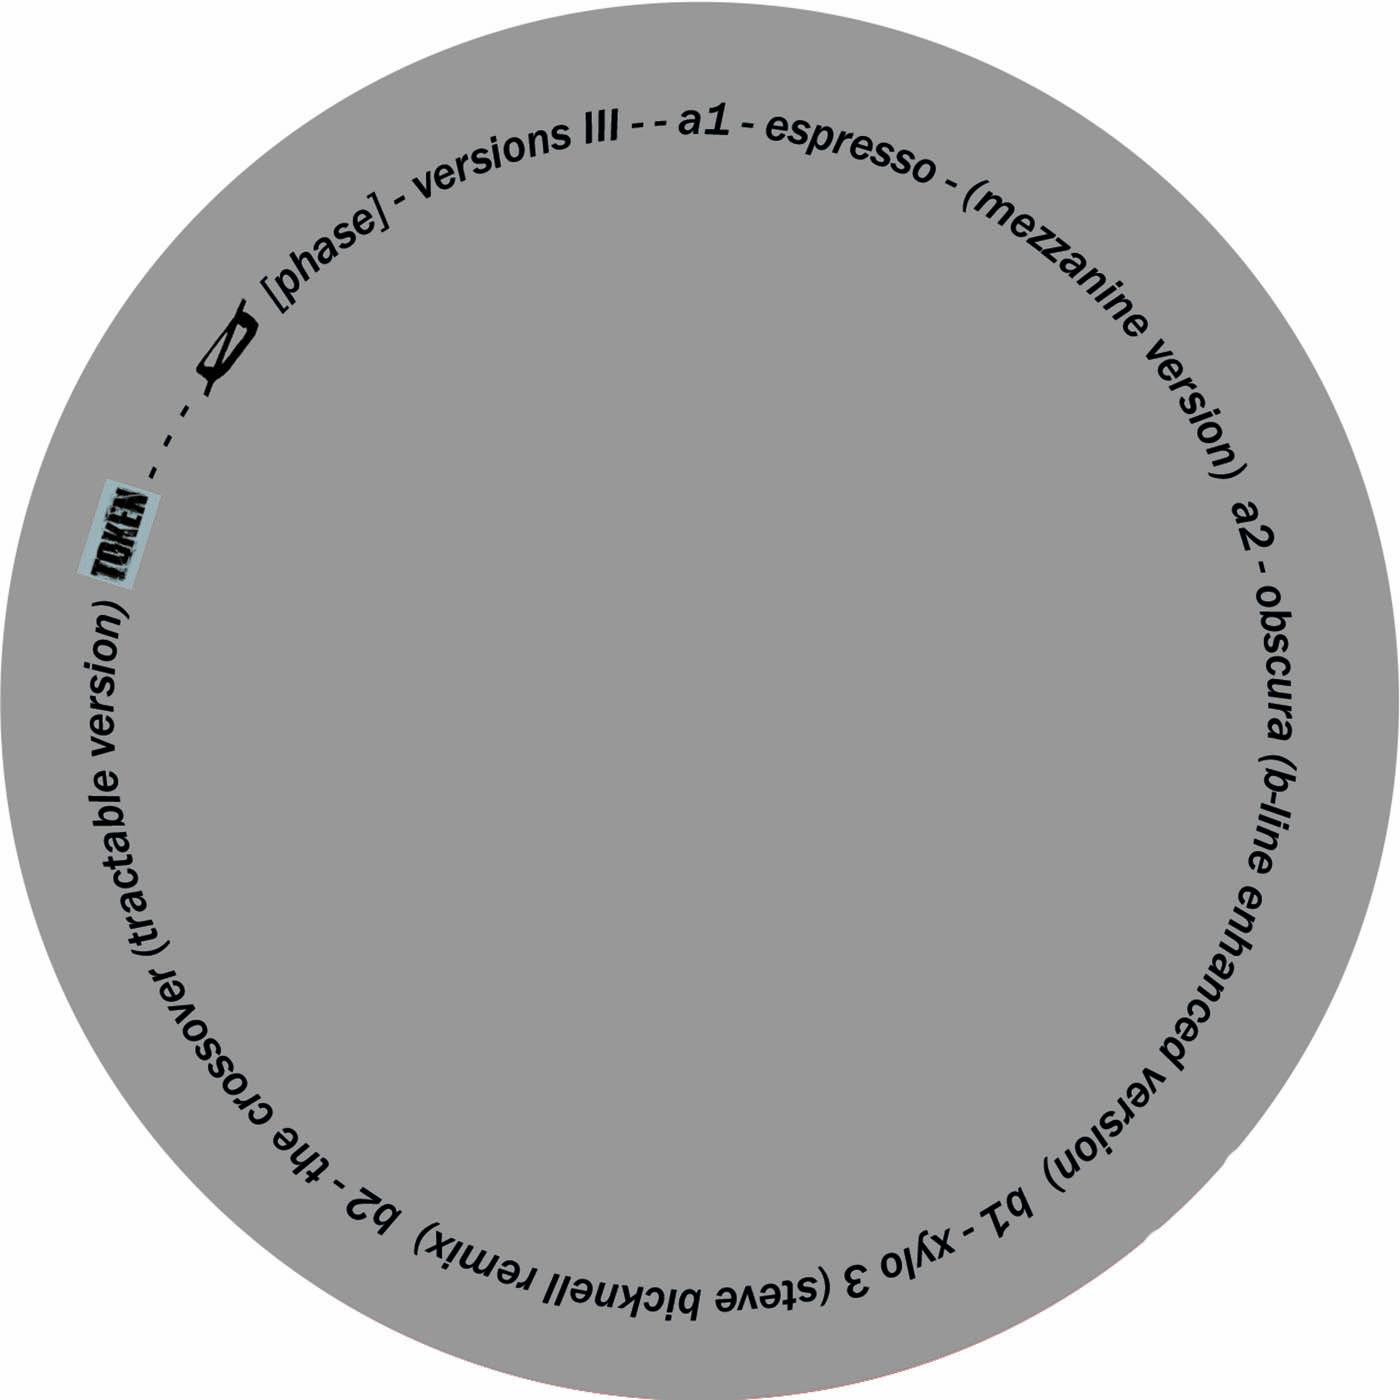 VERSIONS III — Ø [PHASE]